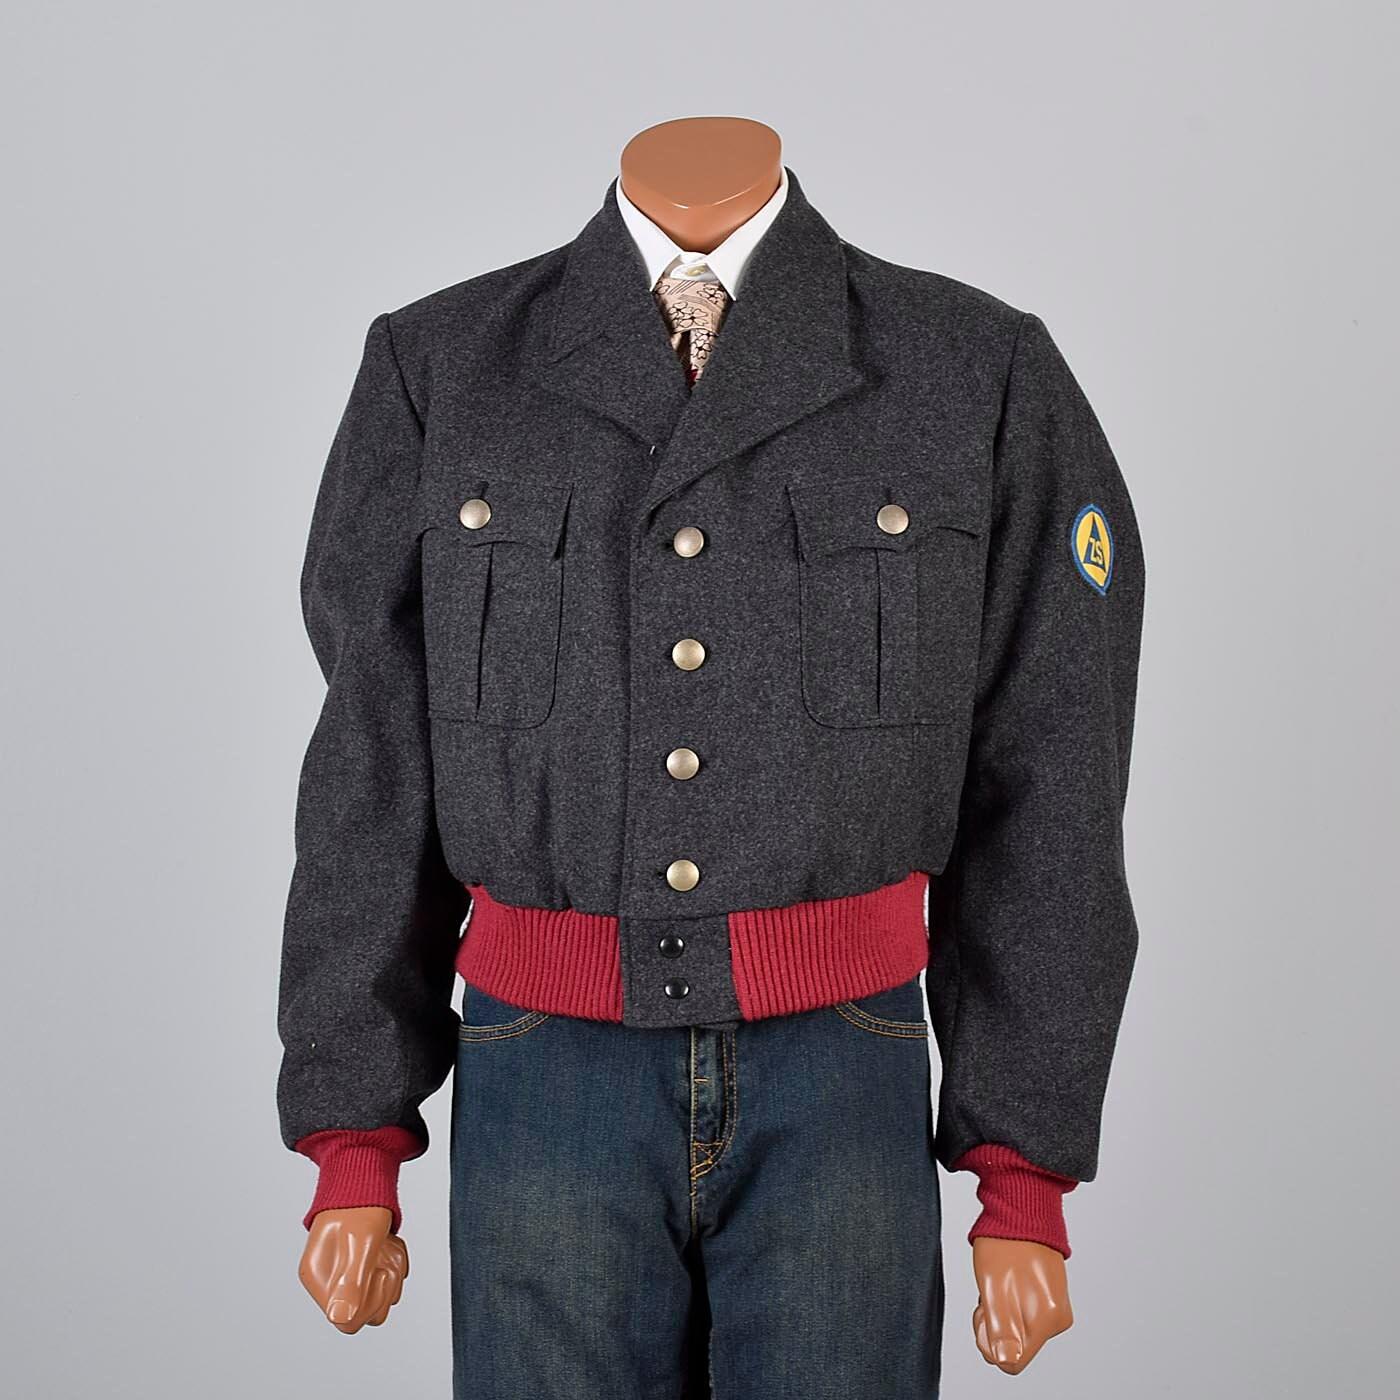 1960s – 70s Men's Ties | Skinny Ties, Slim Ties Mens Vintage 60S Gray Wool German Military Bomber Style Jacket Ribbed Knit Cuffs Waistband Burgundy $129.37 AT vintagedancer.com